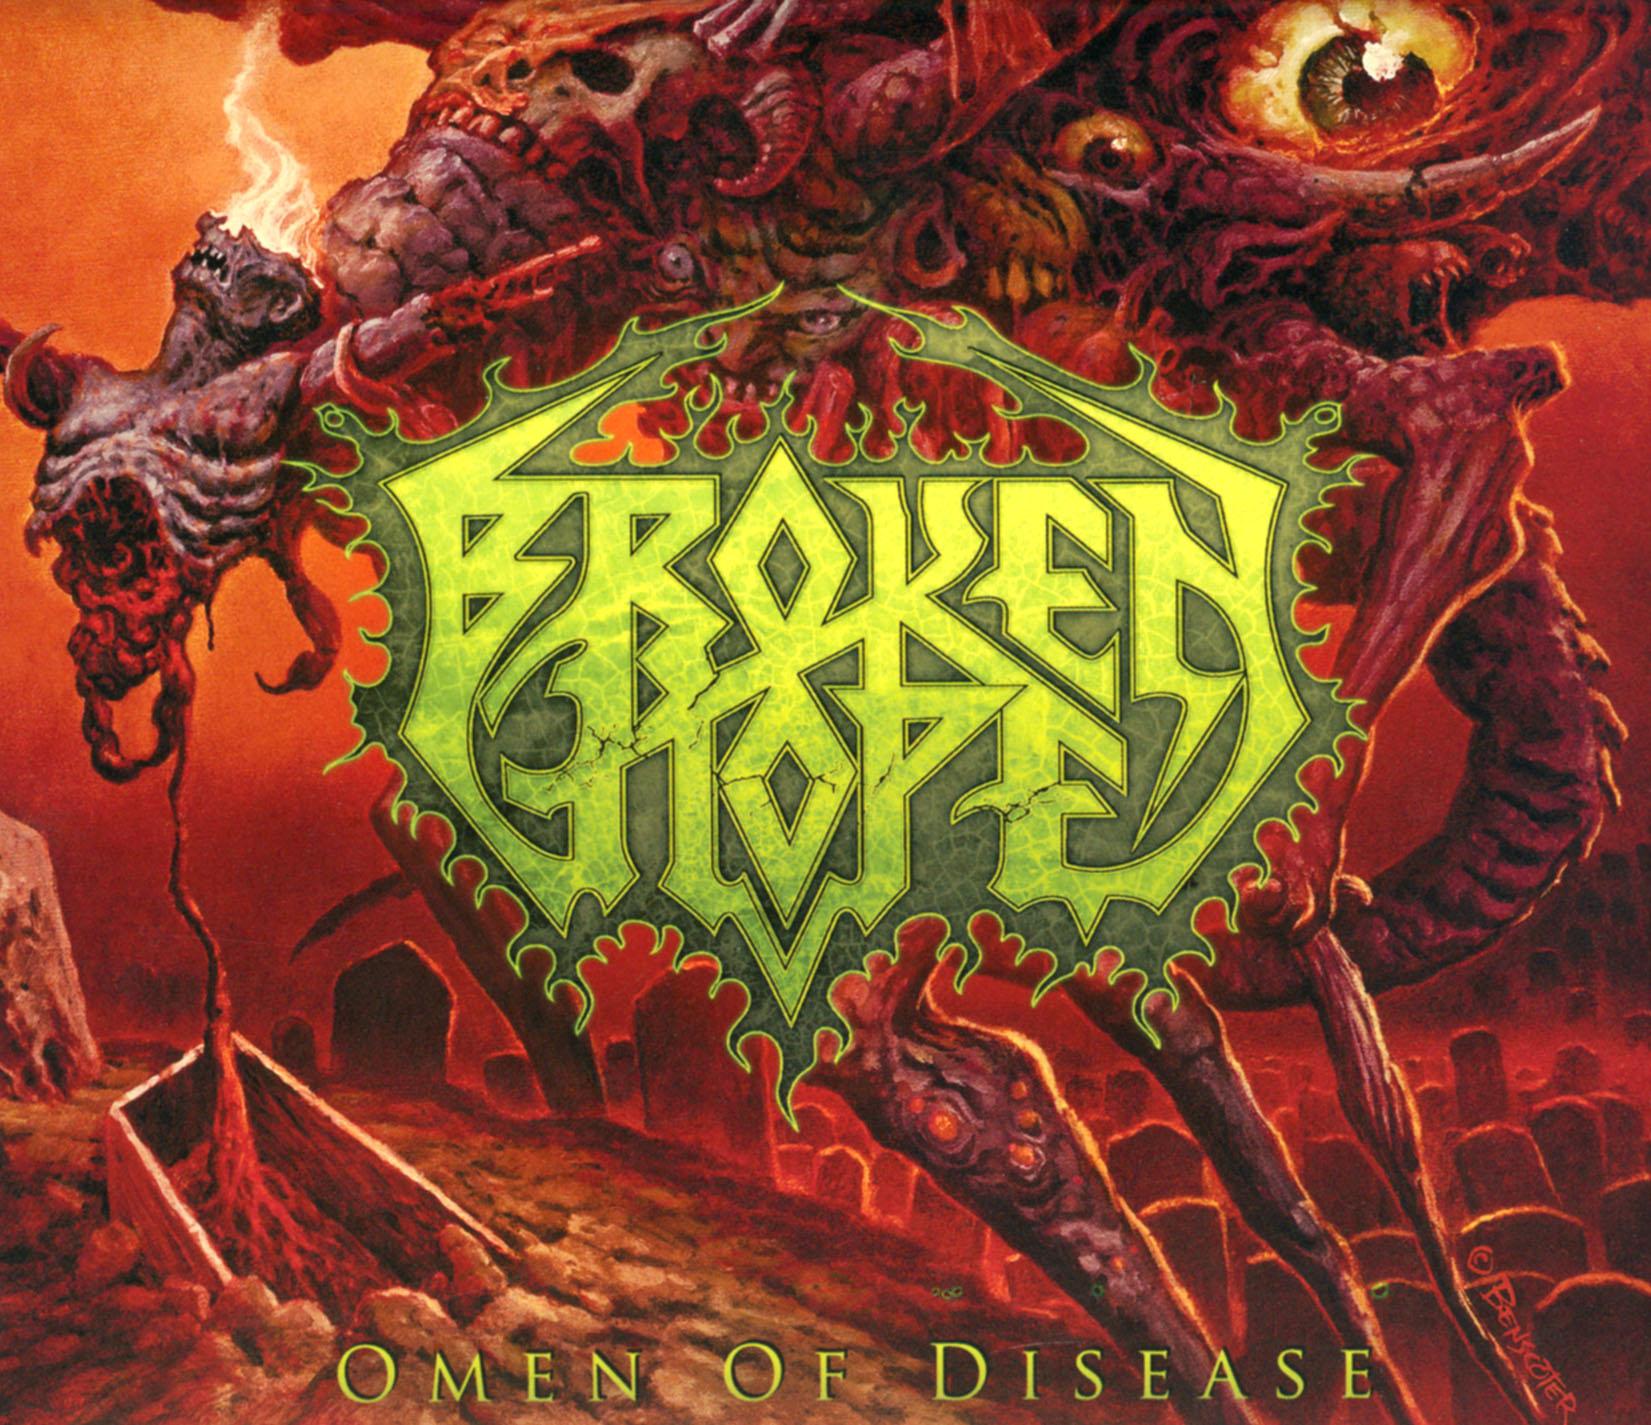 Broken Hope: 25 Years of Sickness - The Broken Hope Story